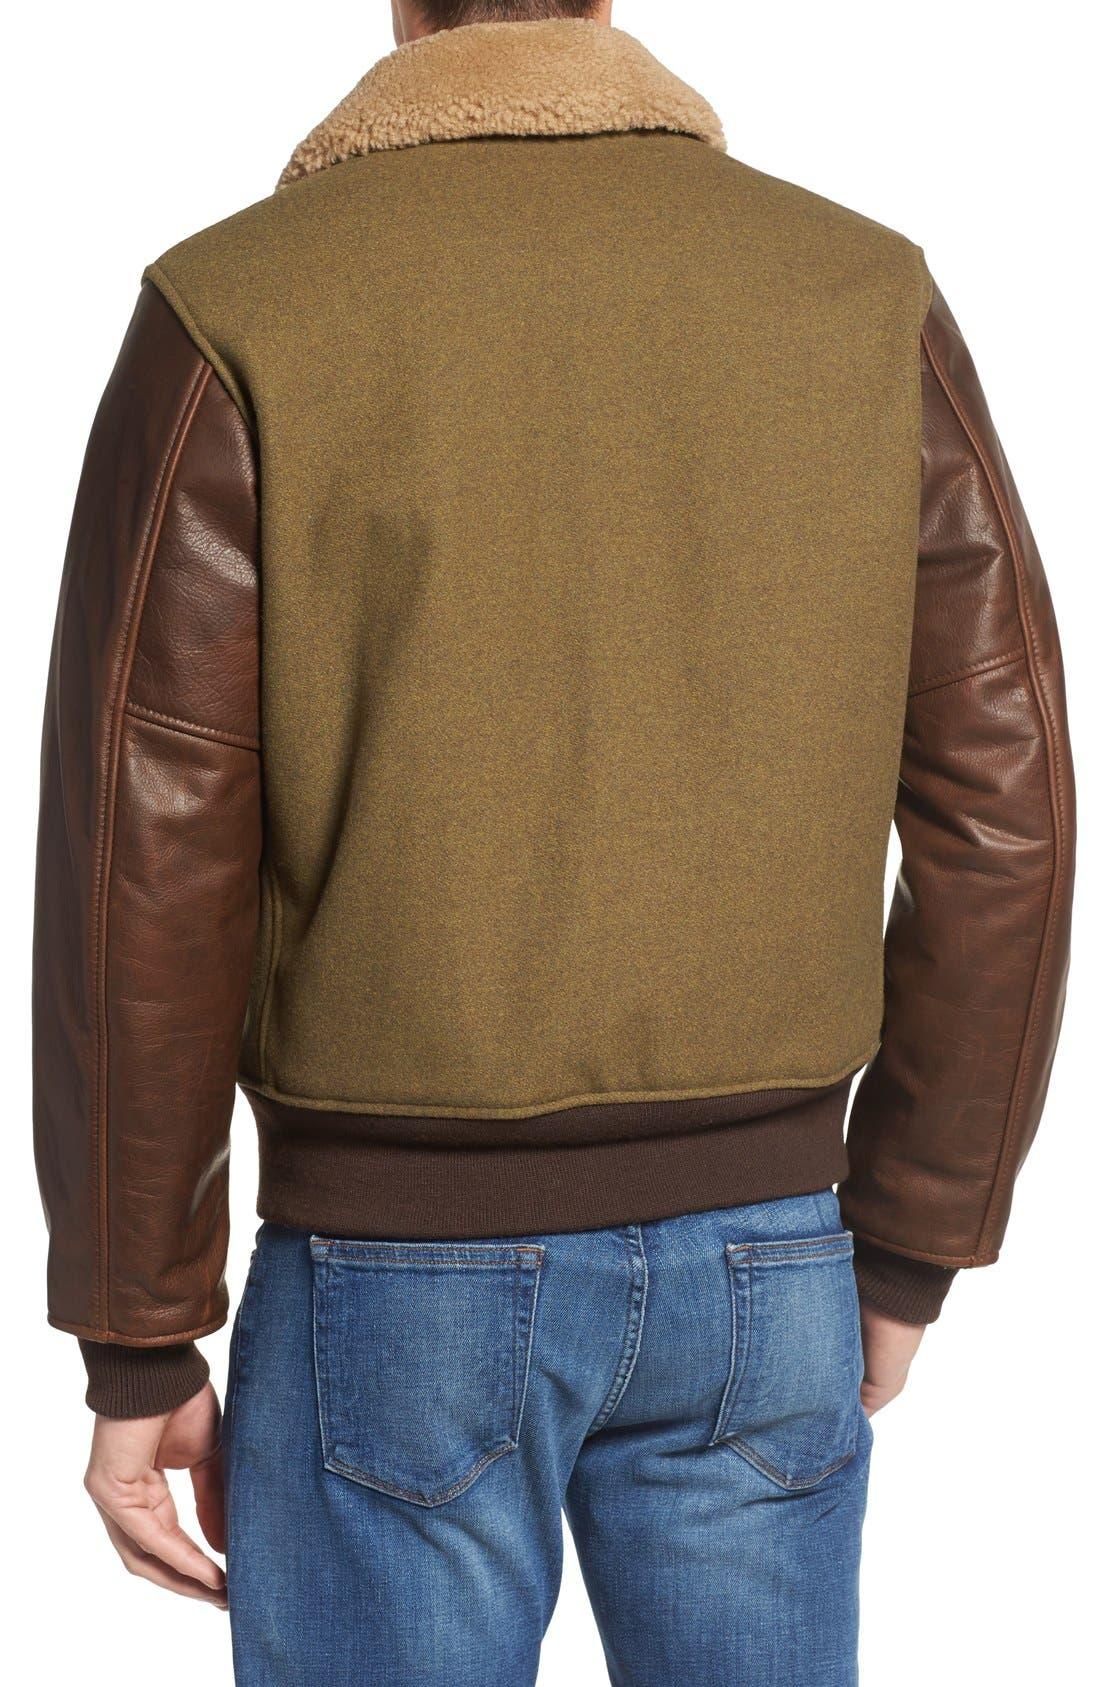 Mixed Media B-15 Flight Jacket with Genuine Shearling Collar,                             Alternate thumbnail 3, color,